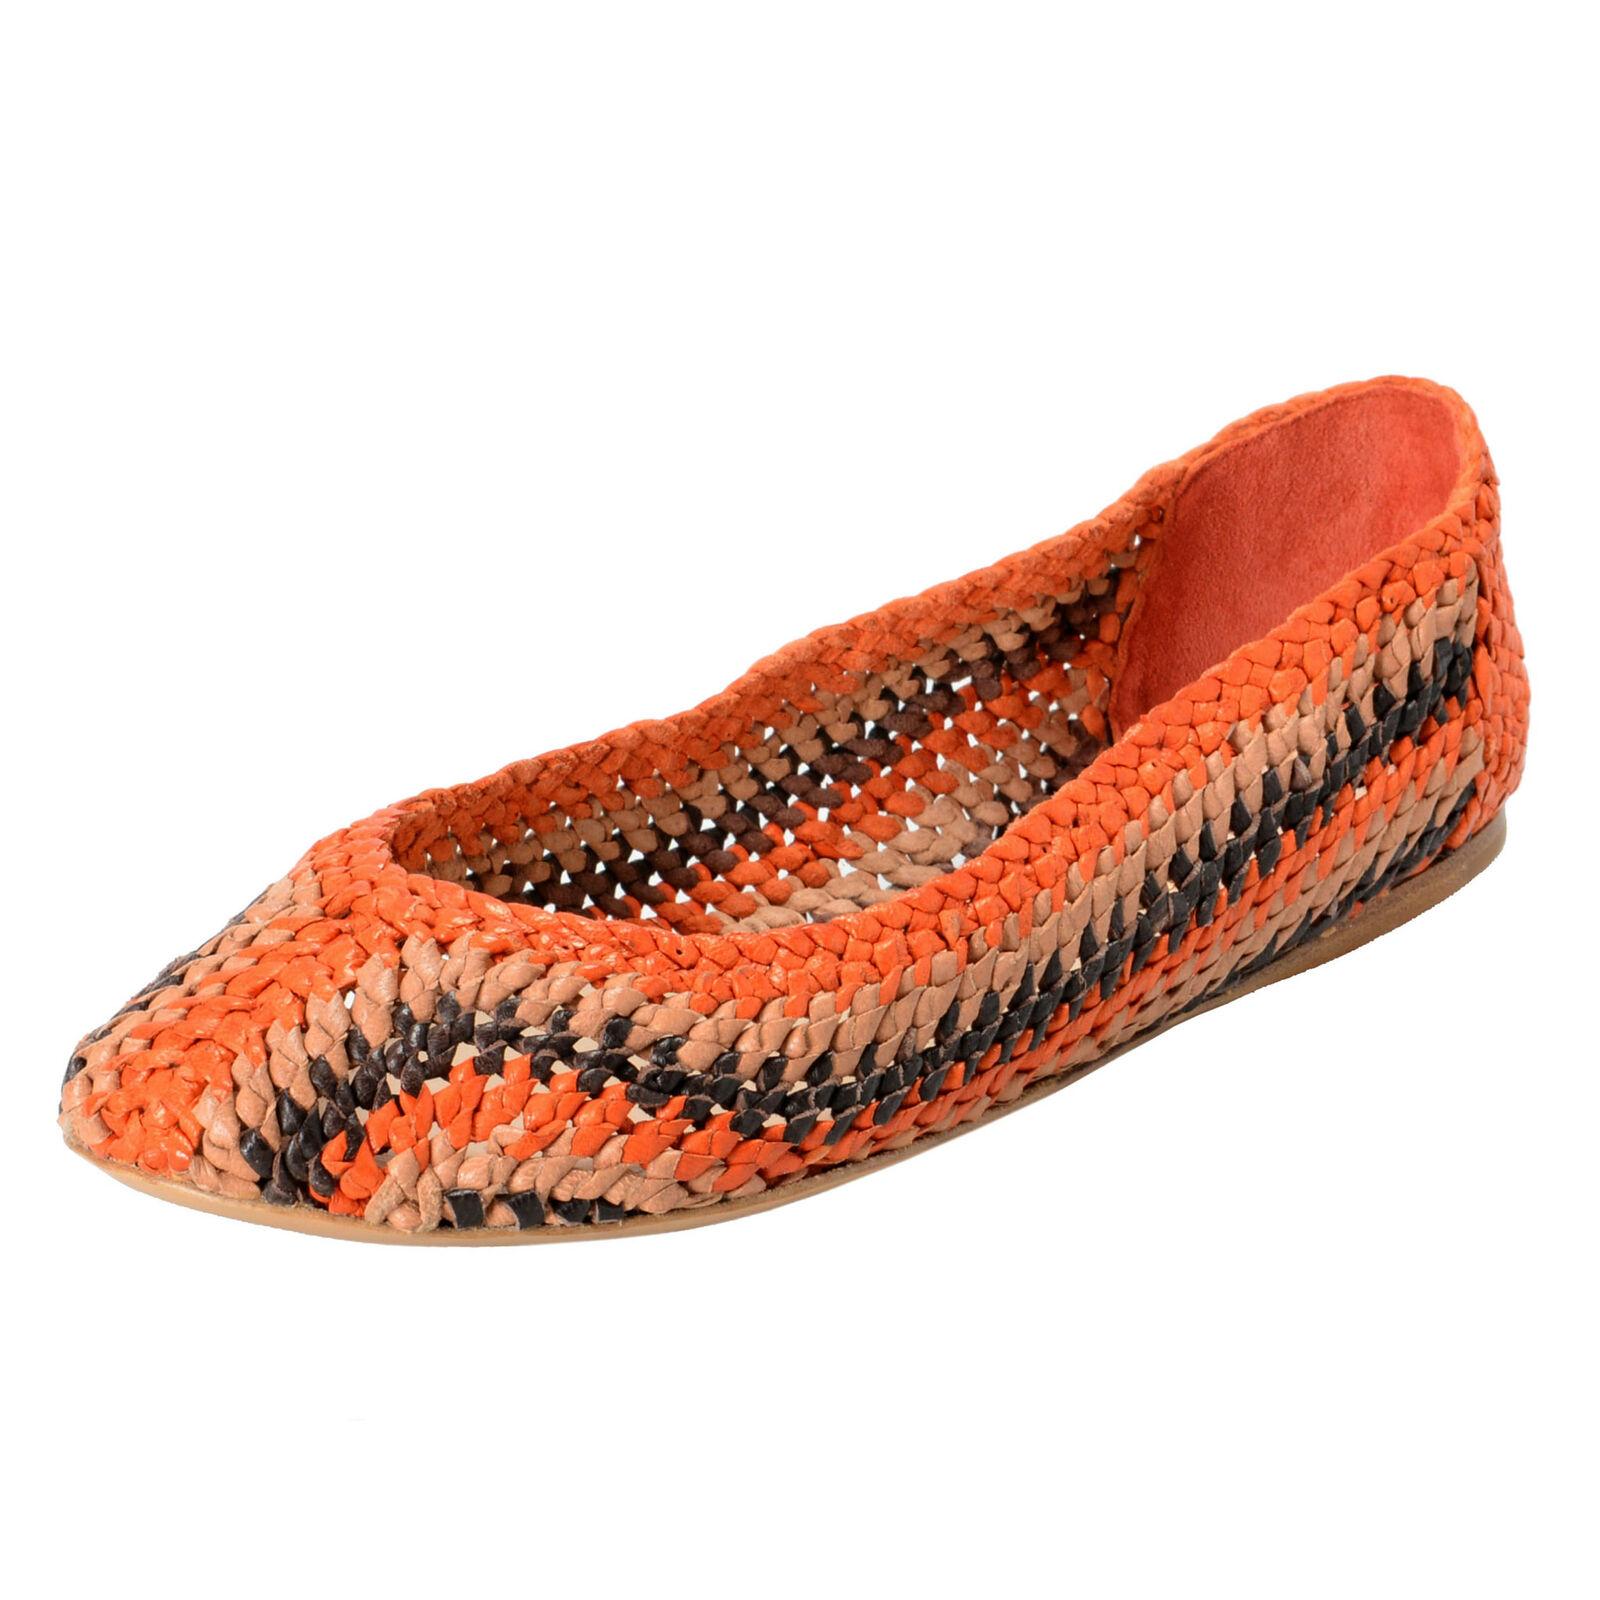 Prada Damen Mehrfarbig Leder Ballerinas Schuhe Größe 8.5 9.5